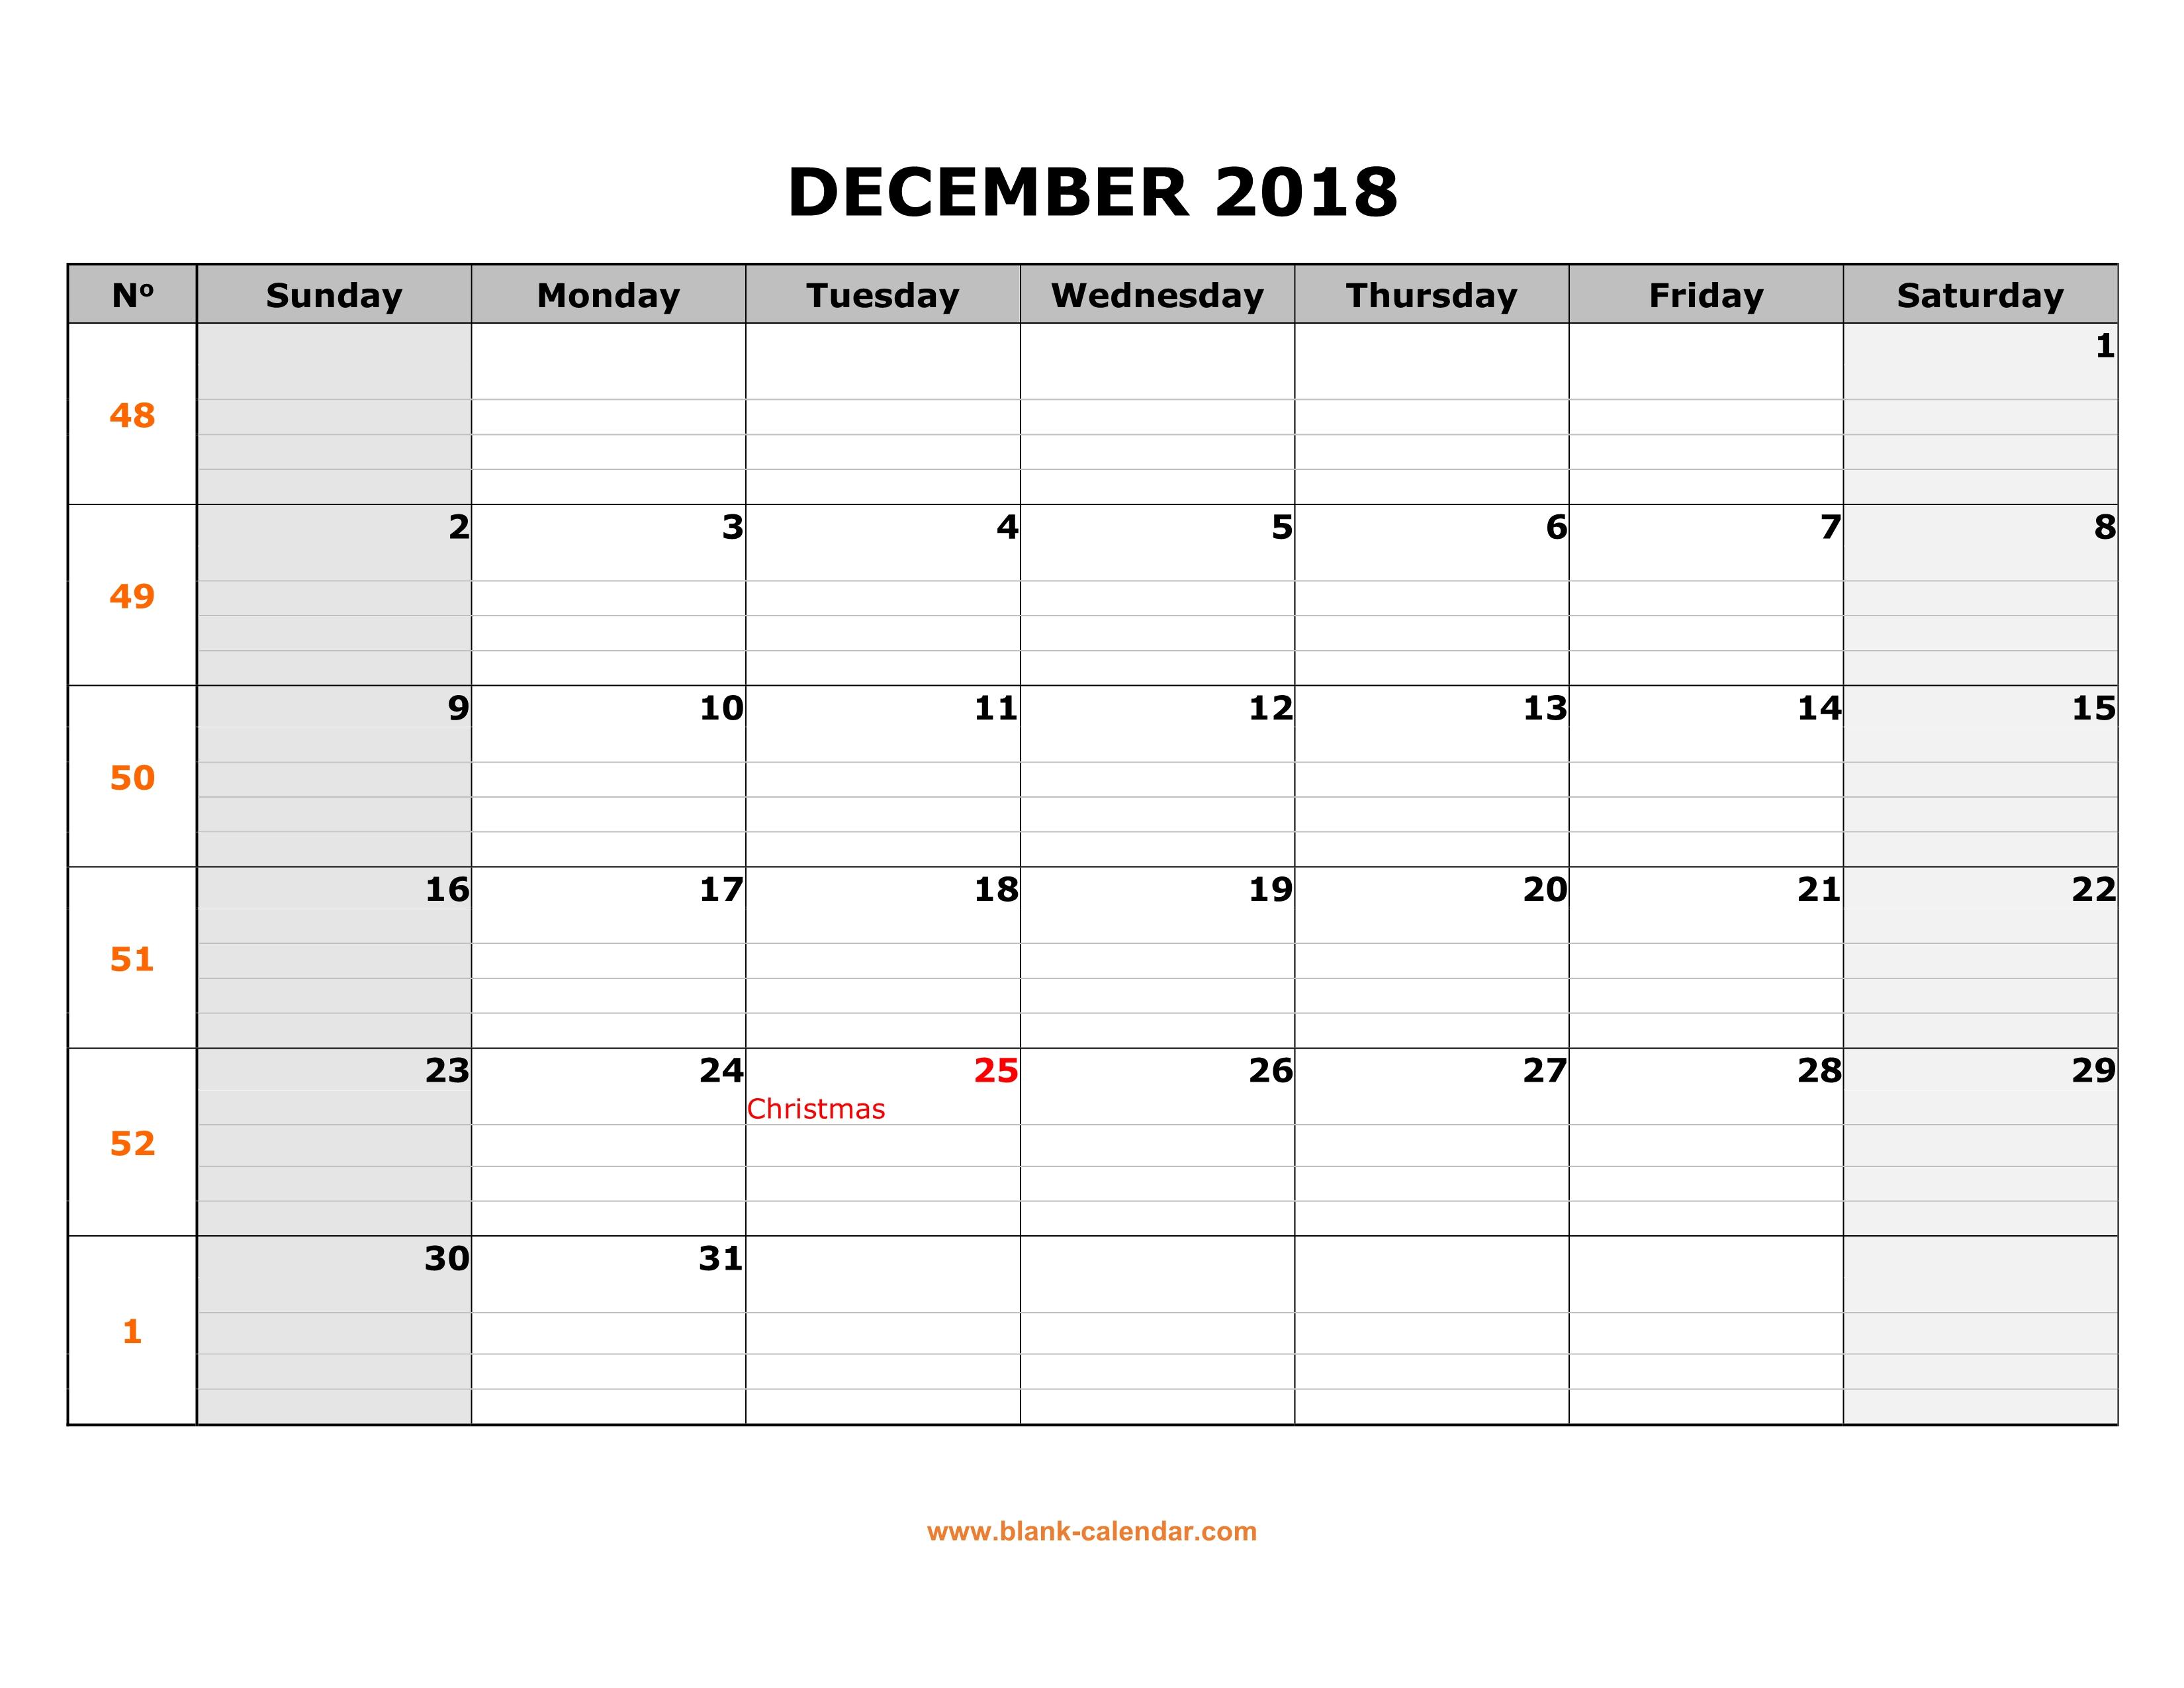 Free Download Printable December 2018 Calendar, Large Box Grid throughout Blank Printable Calendars December